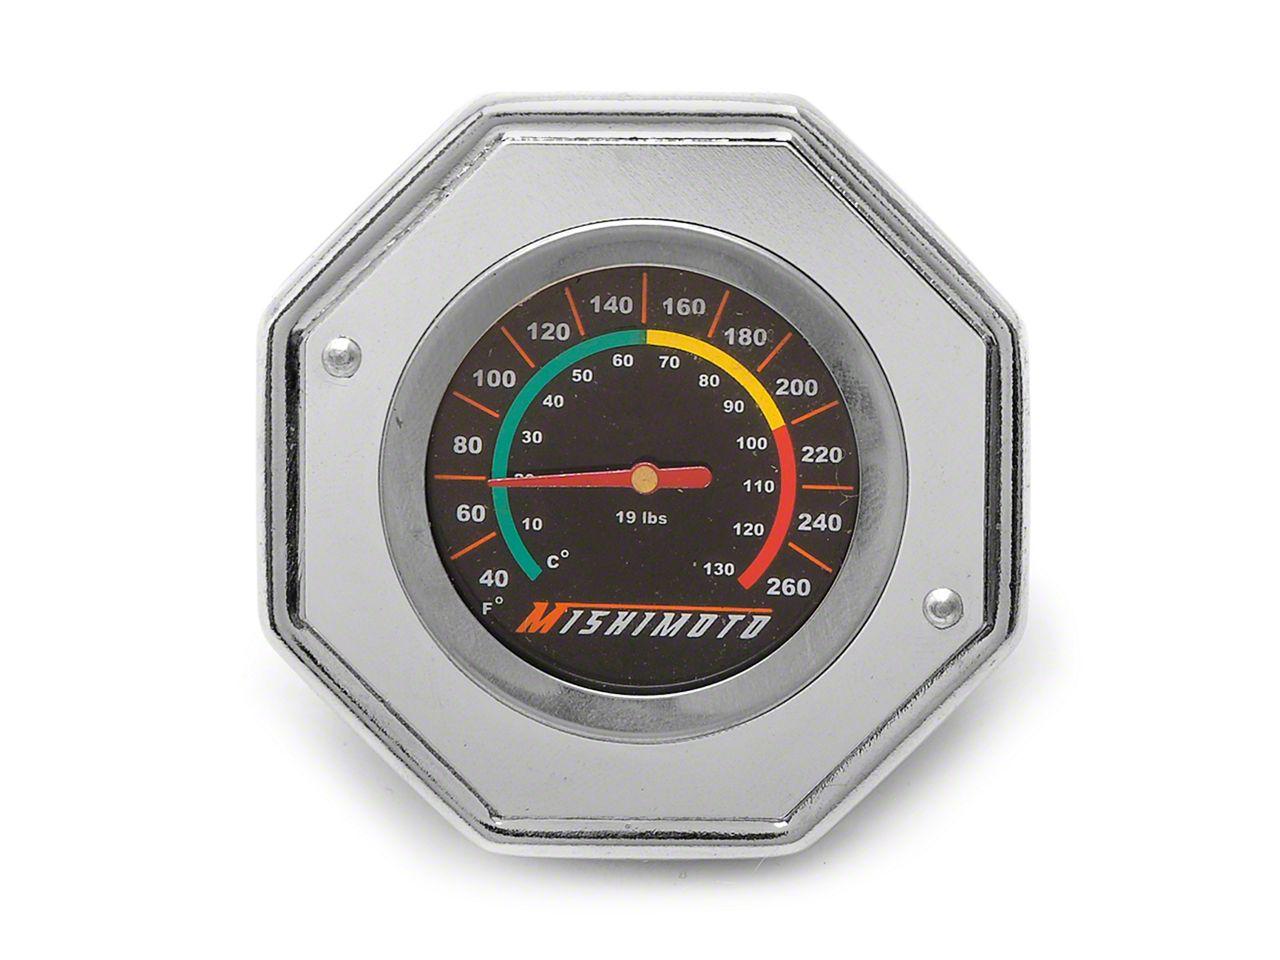 Mishimoto Performance Radiator Cap w/ Temperature Gauge (79-14 All)